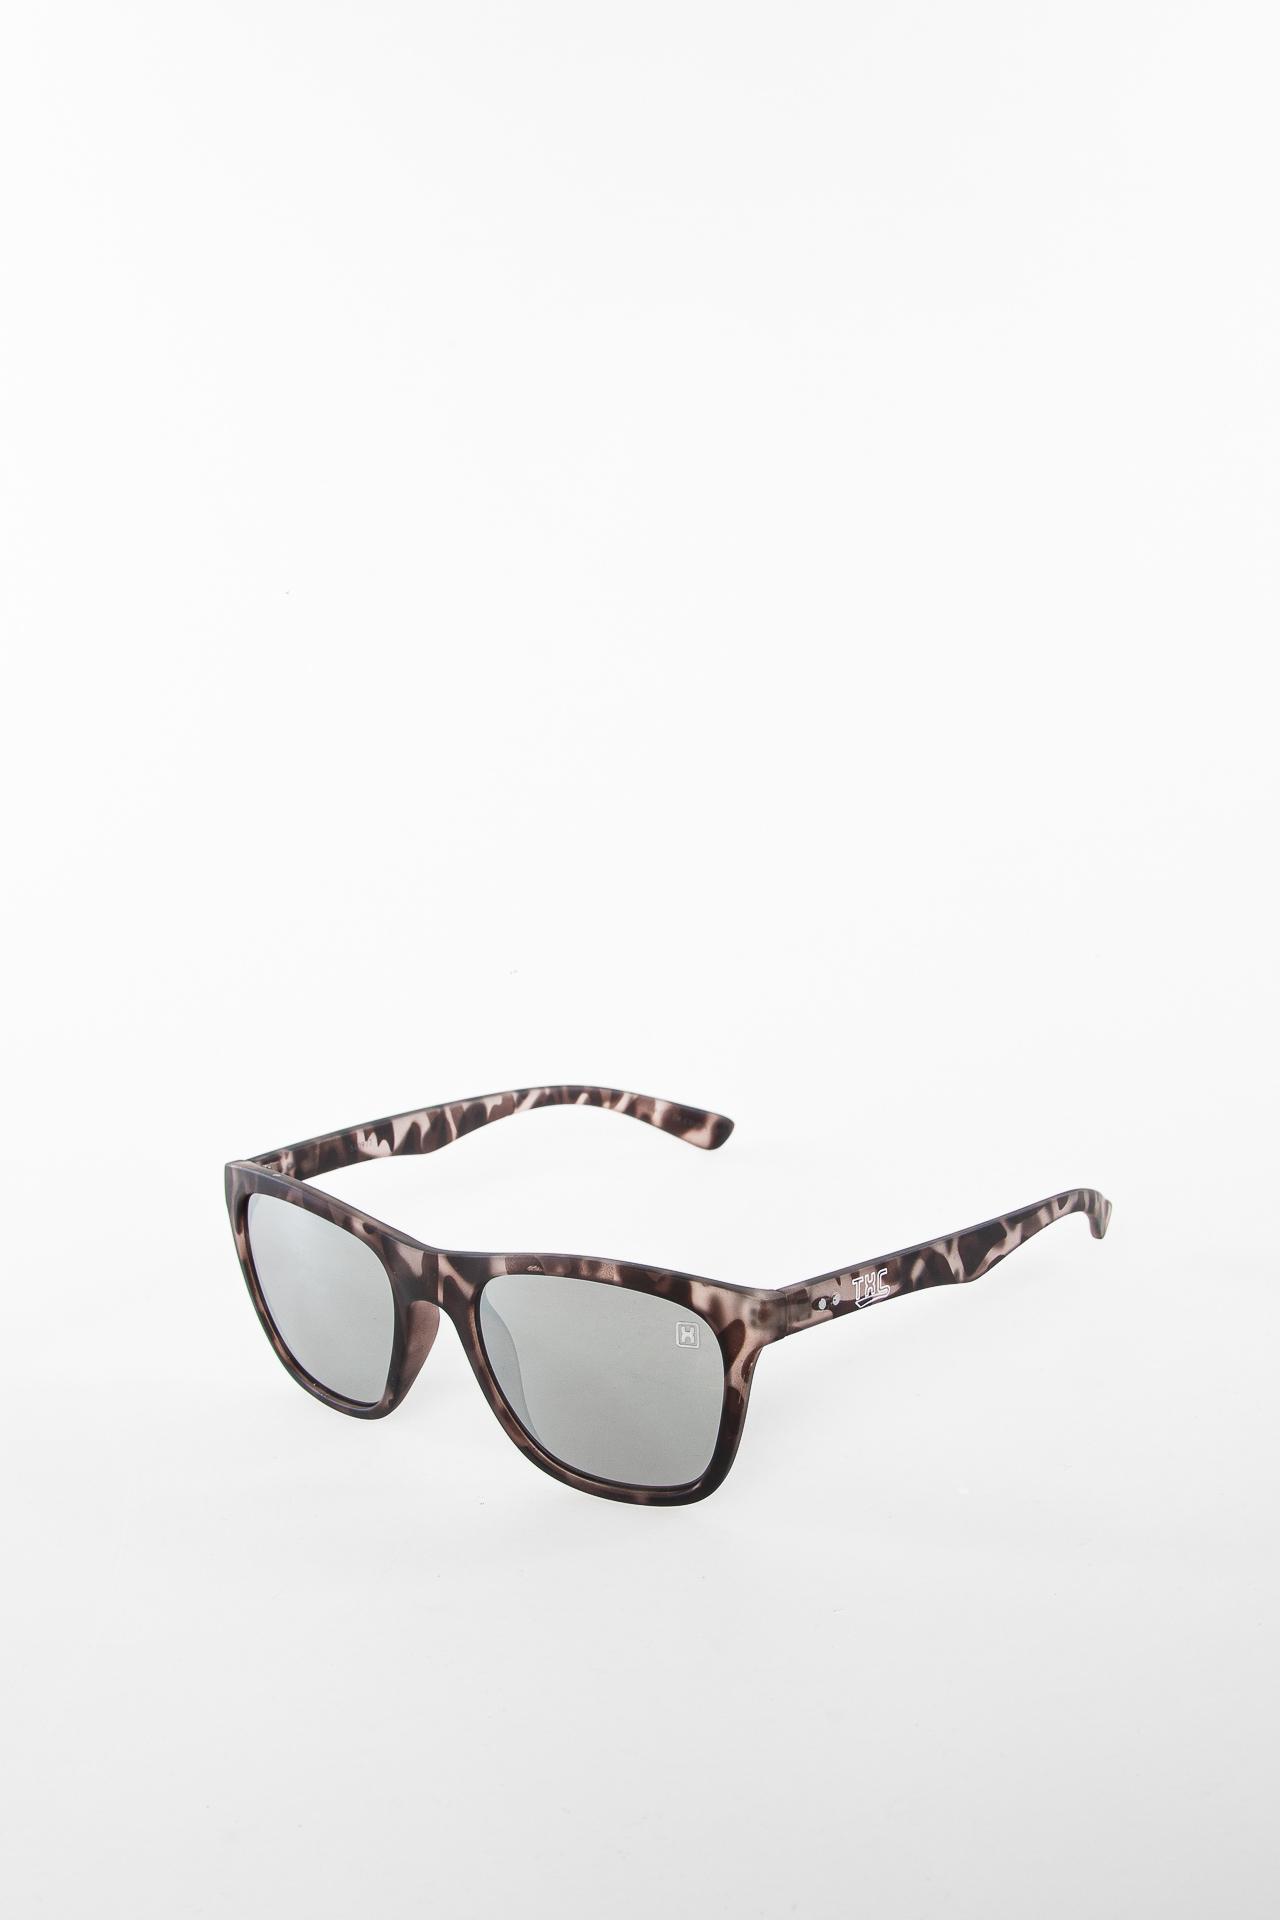 Óculos de Sol TXC 77.1 OC